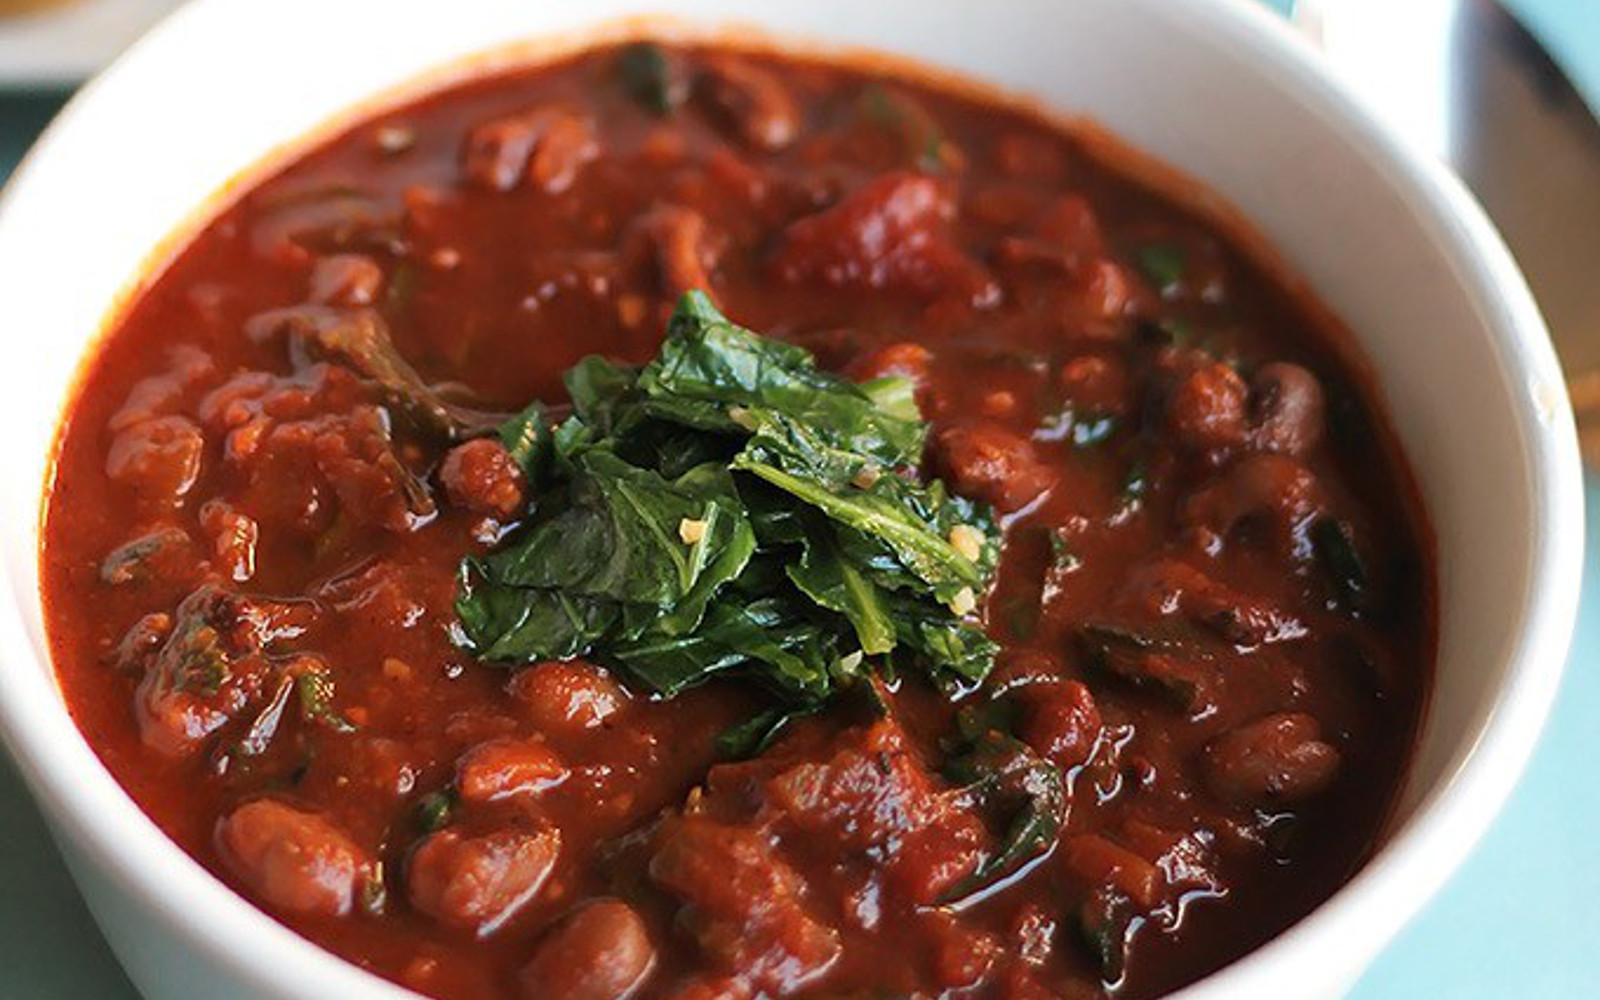 Vegan Black-Eyed Pea Chili With Collards